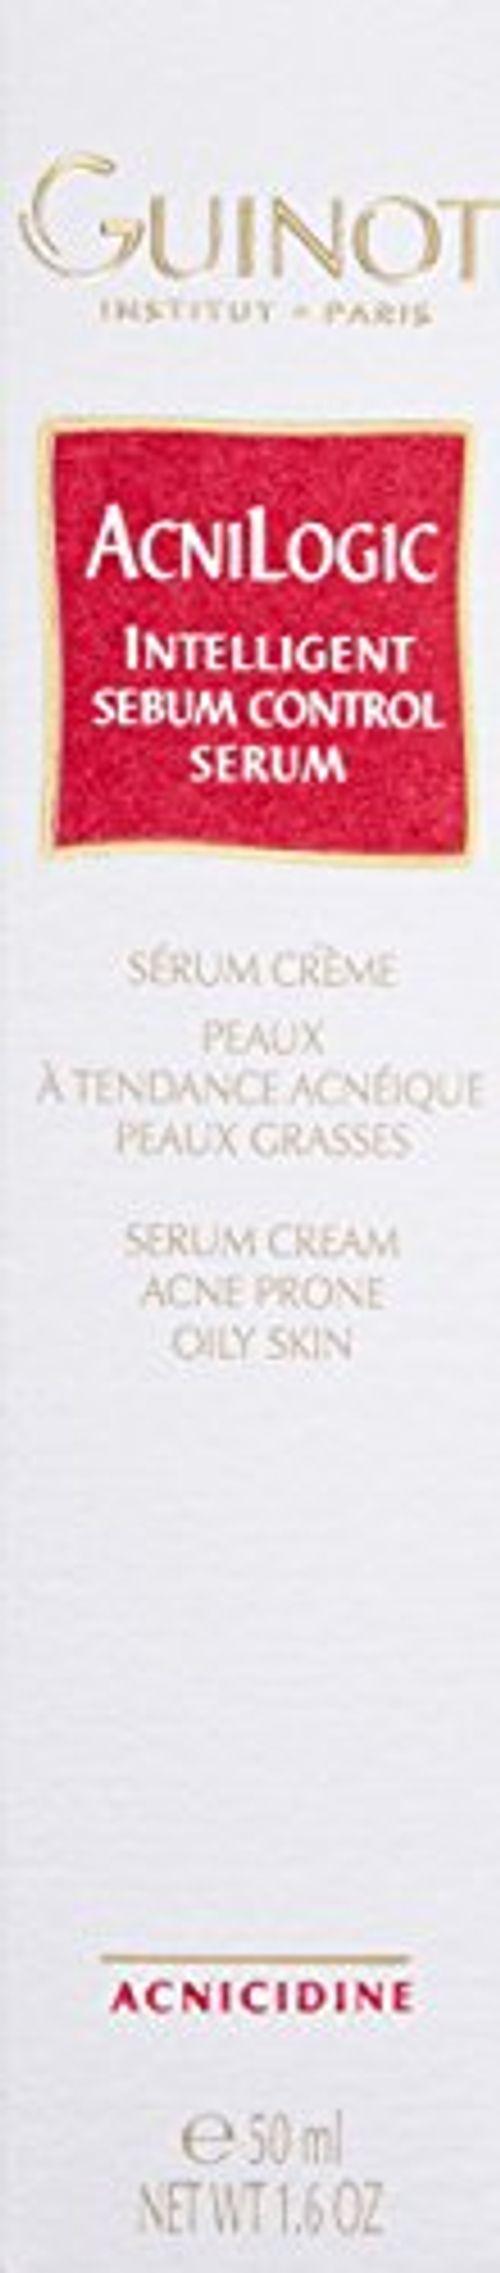 photo Wallpaper of GUINOT-Guinot Acnilogic Intelligent Sebum Control Serum Serum   50 Ml-normal